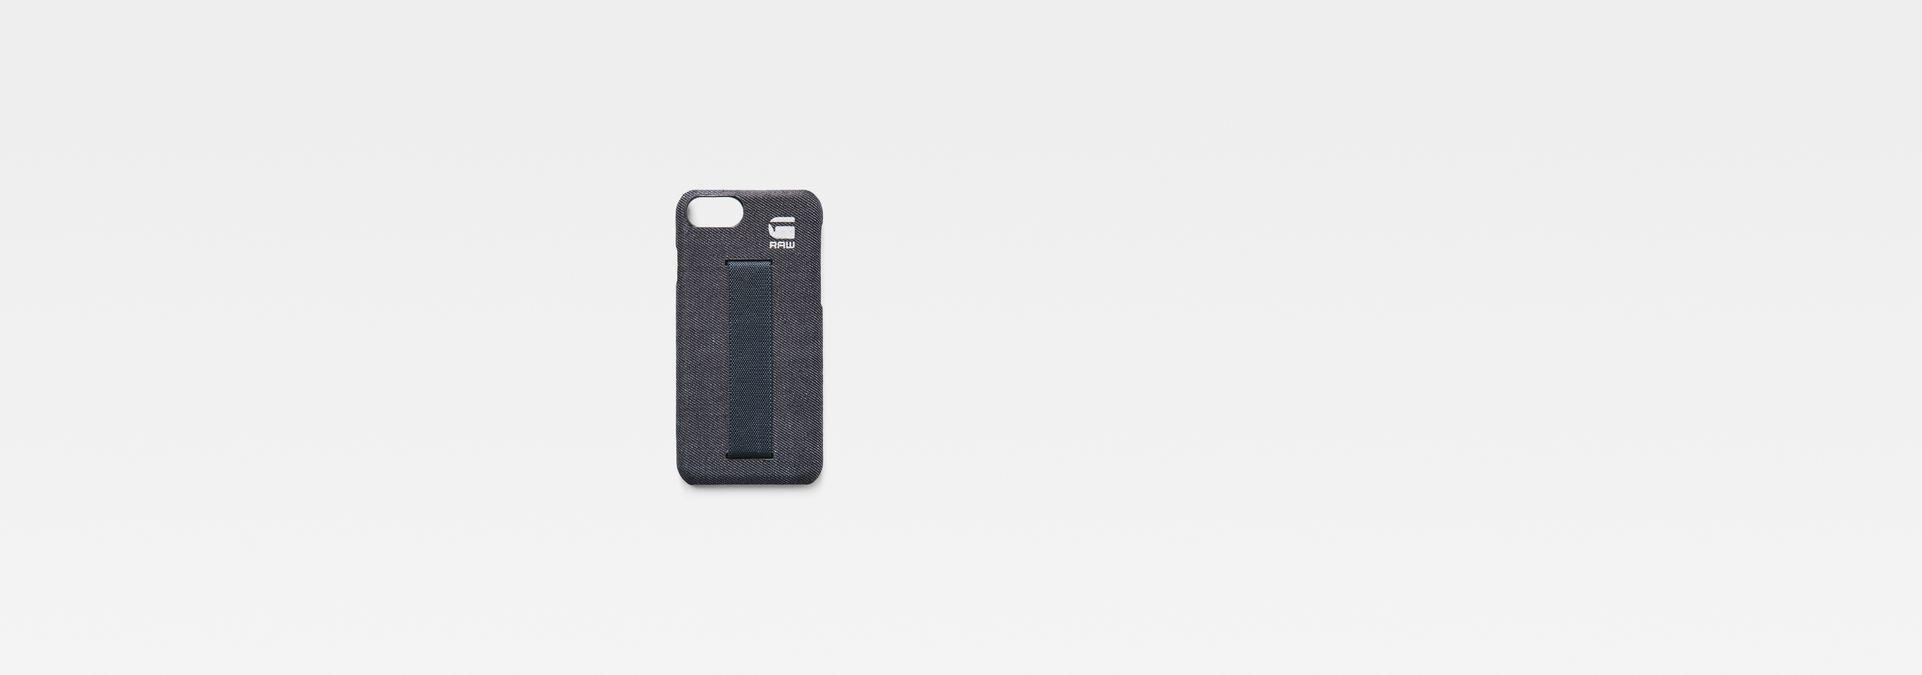 G-Star RAW Case For iPhone 6/7 | Indigo | Men | G-Star RAW®